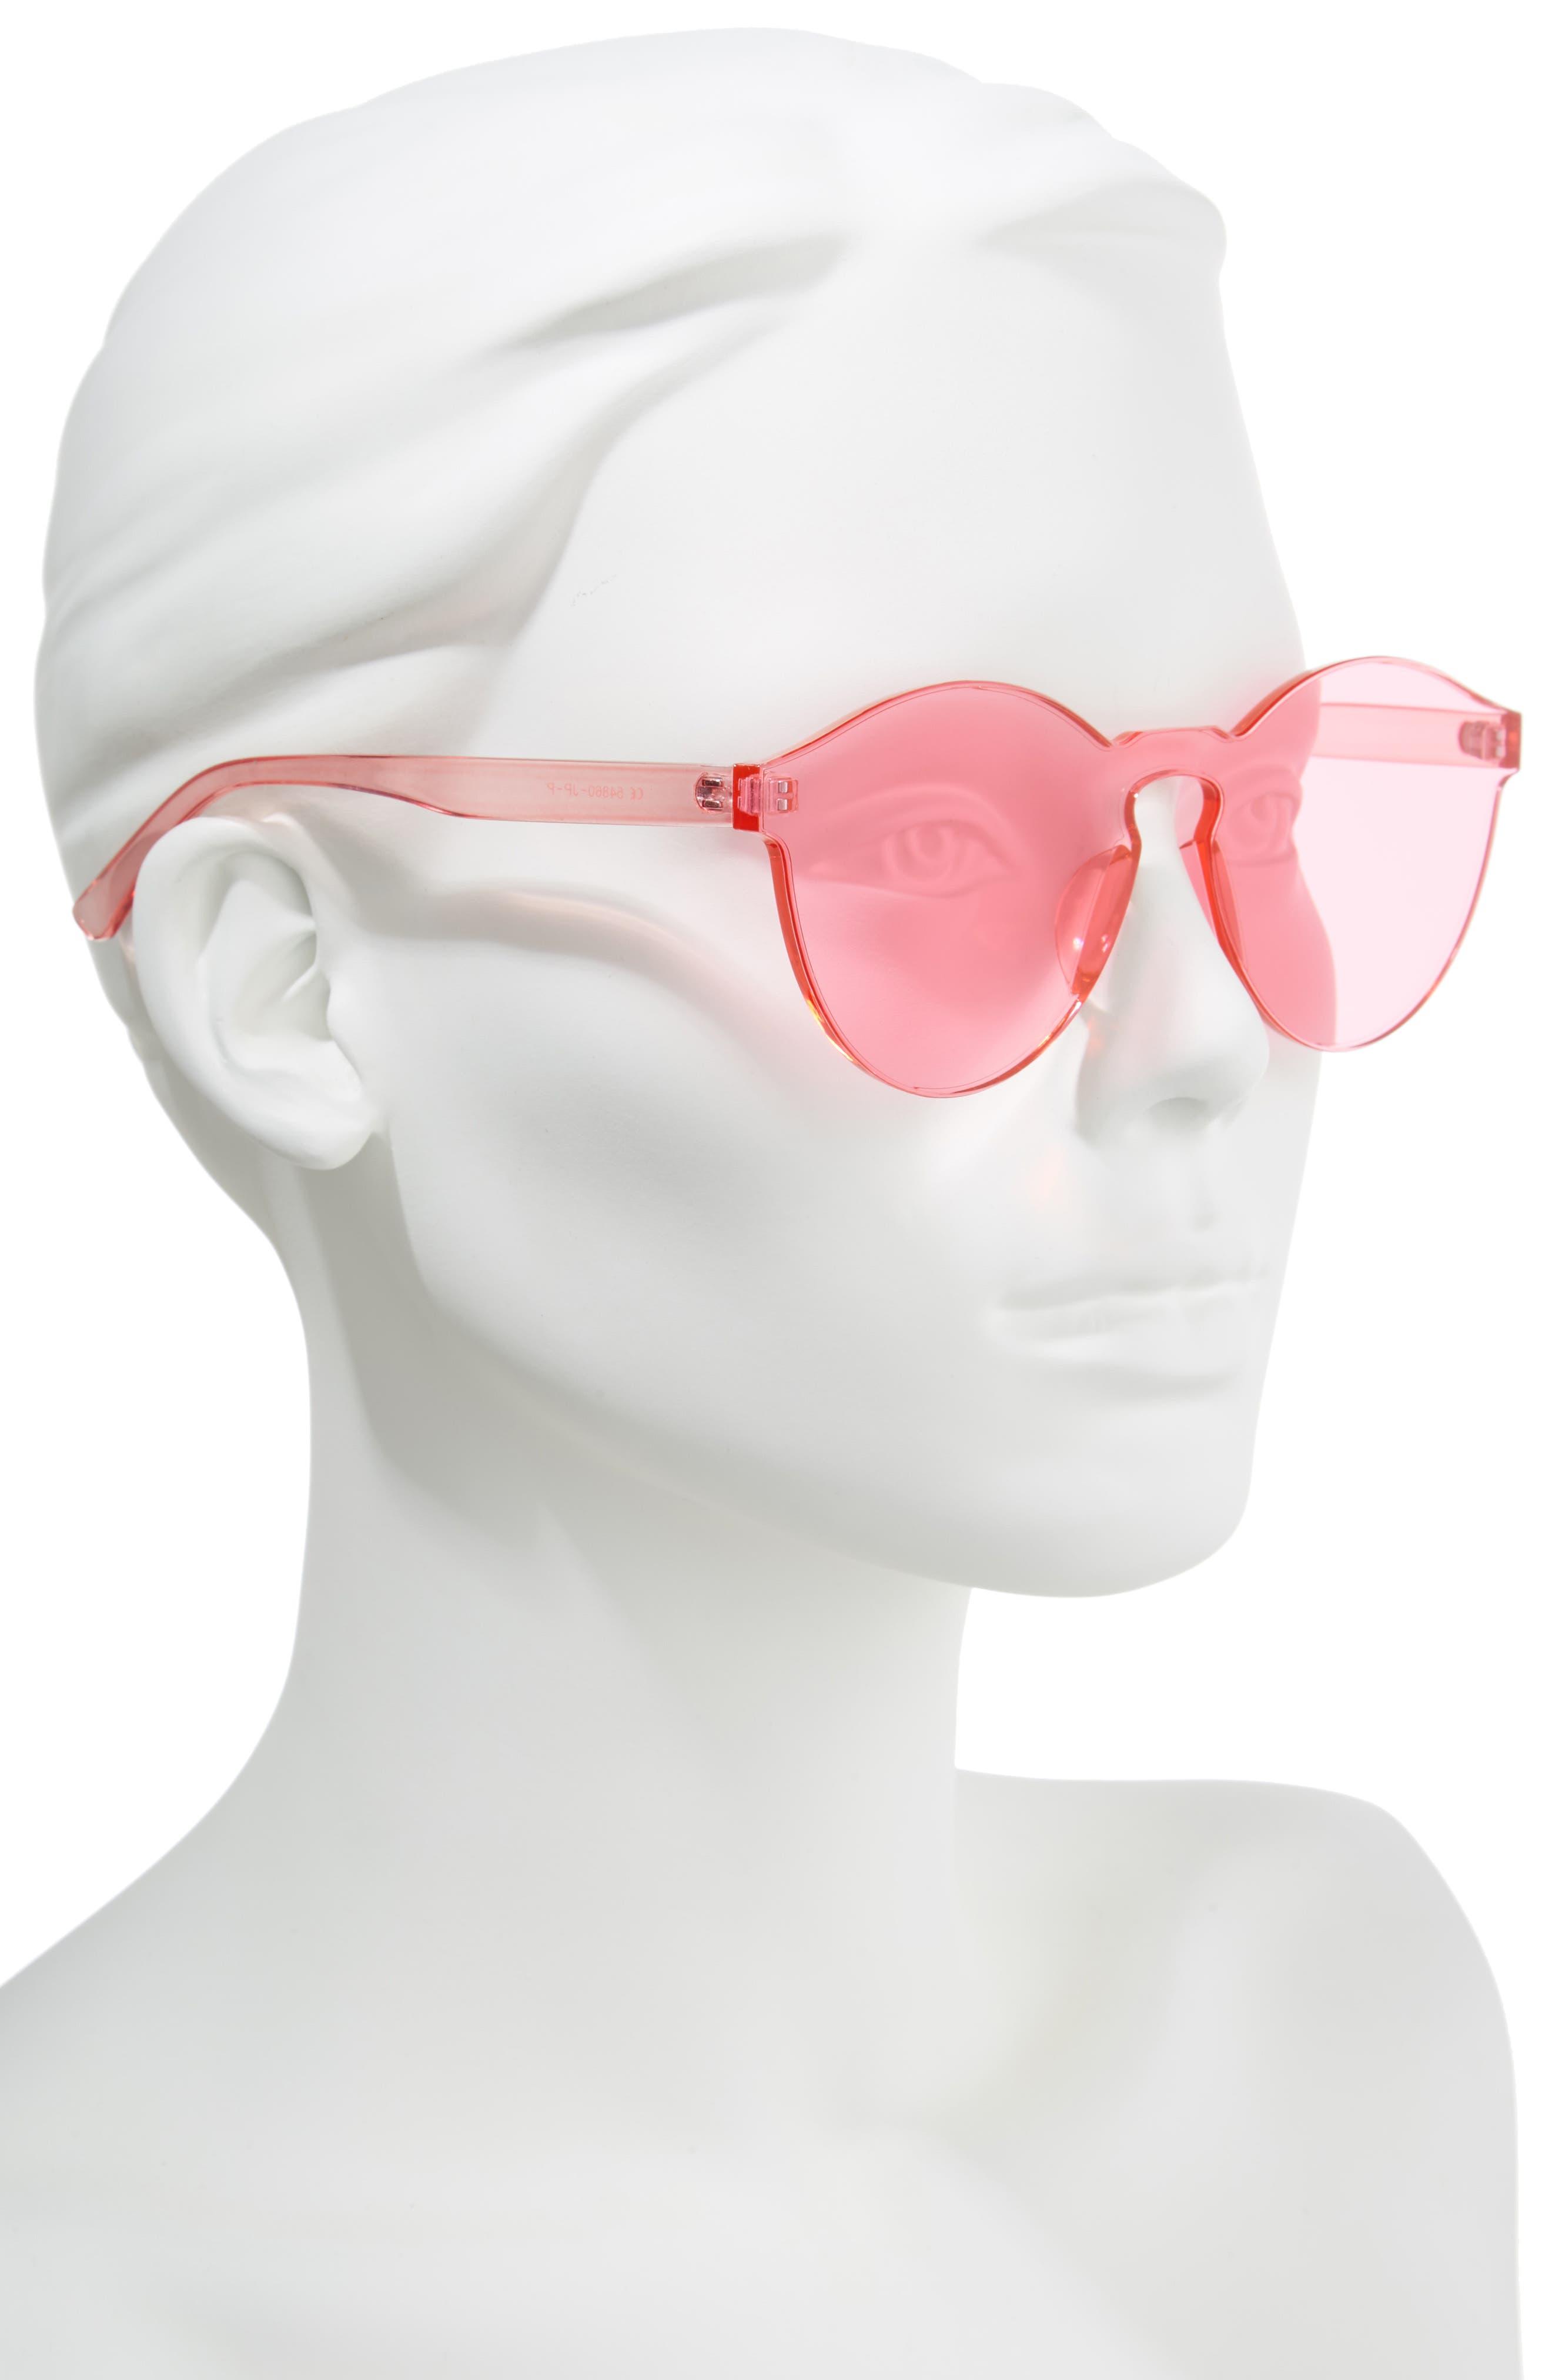 59mm Rimless Round Sunglasses,                             Alternate thumbnail 2, color,                             650